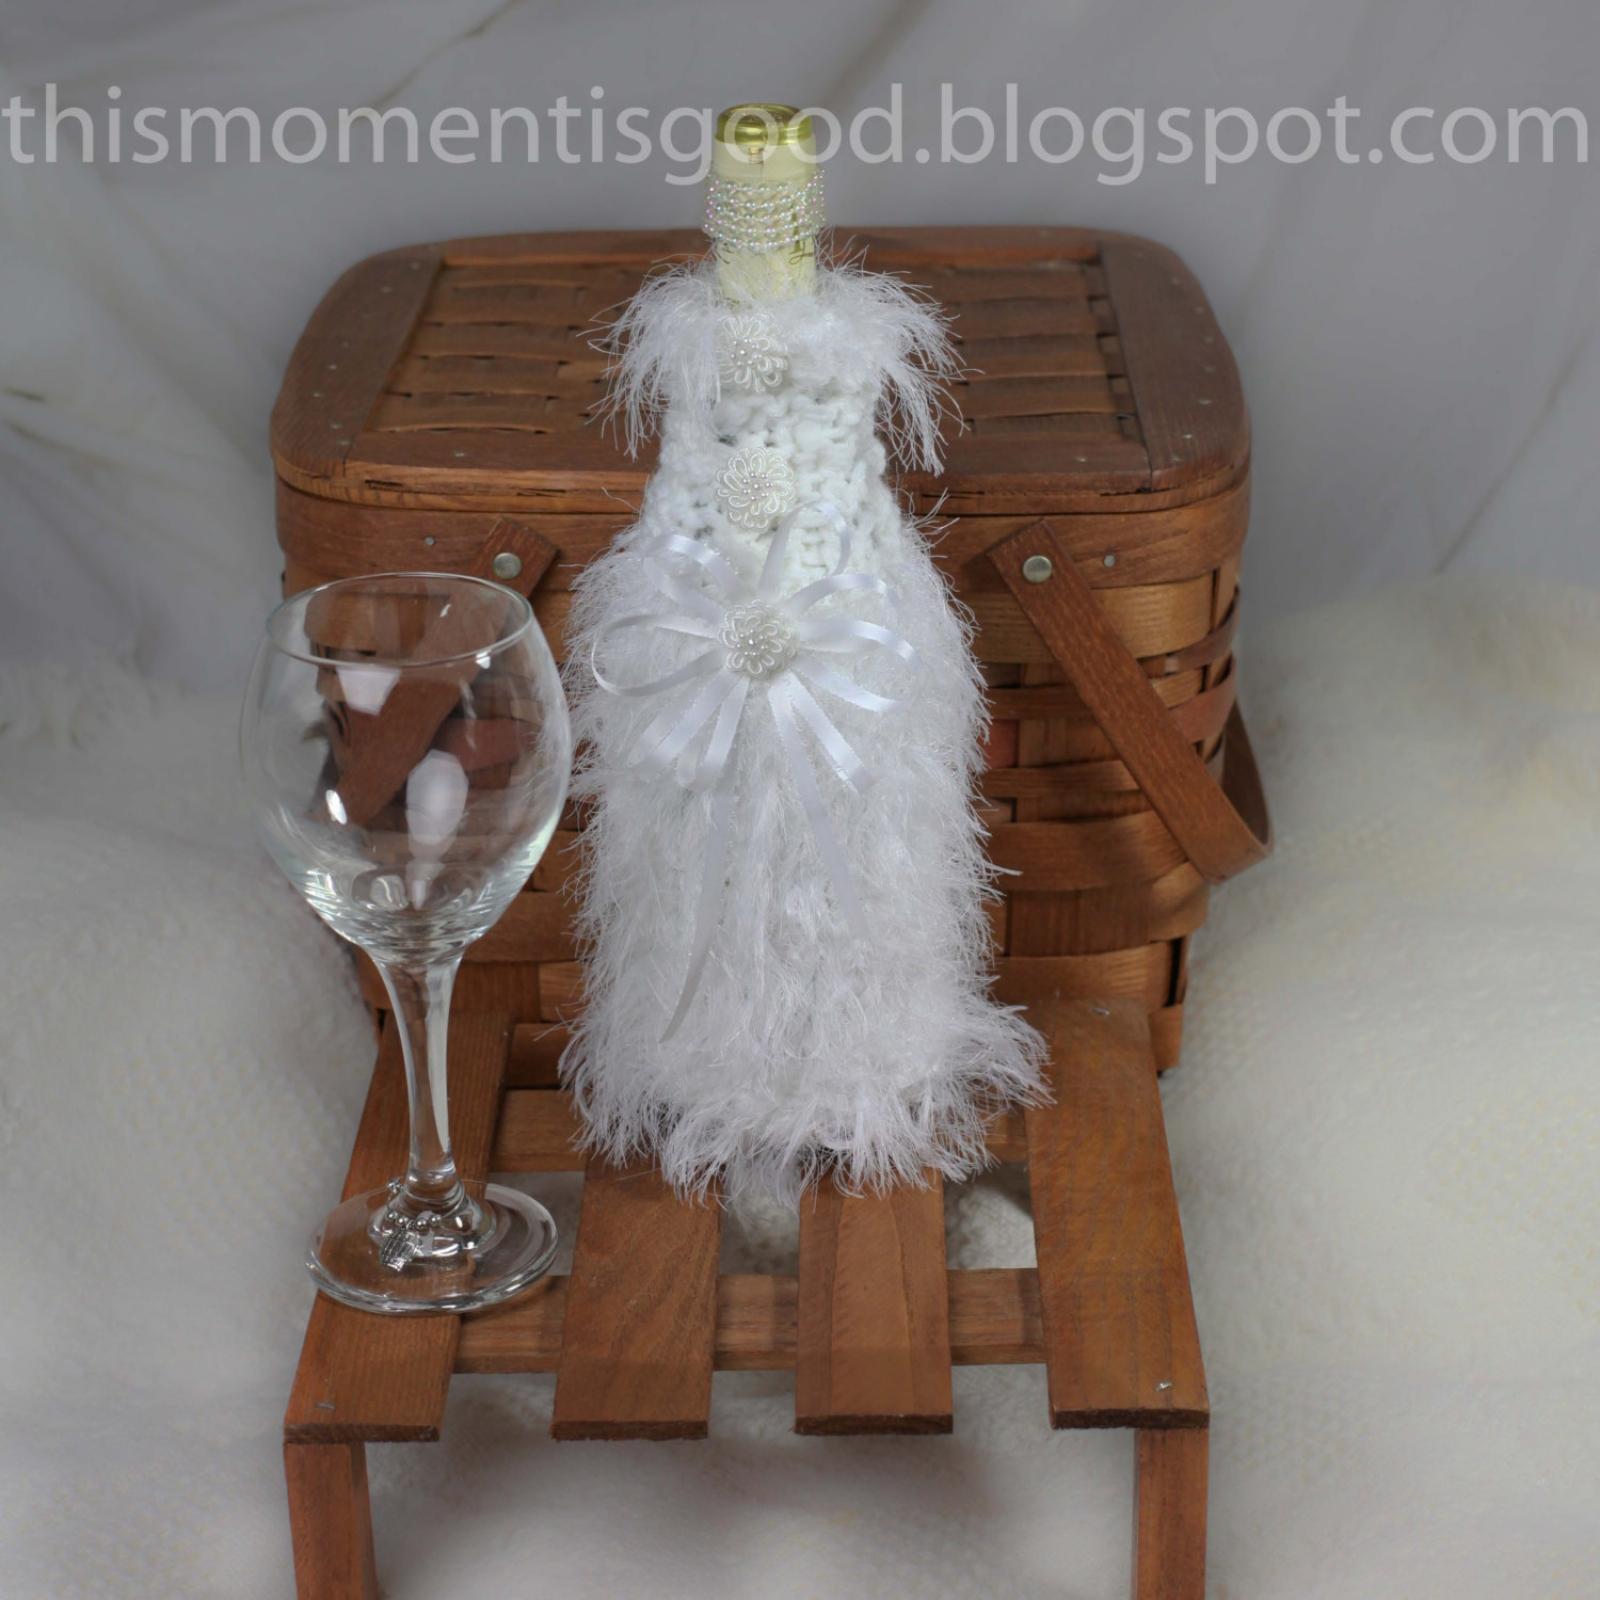 Loom Knit Wine Bottle Cover Pattern Bride Amp Groom 2